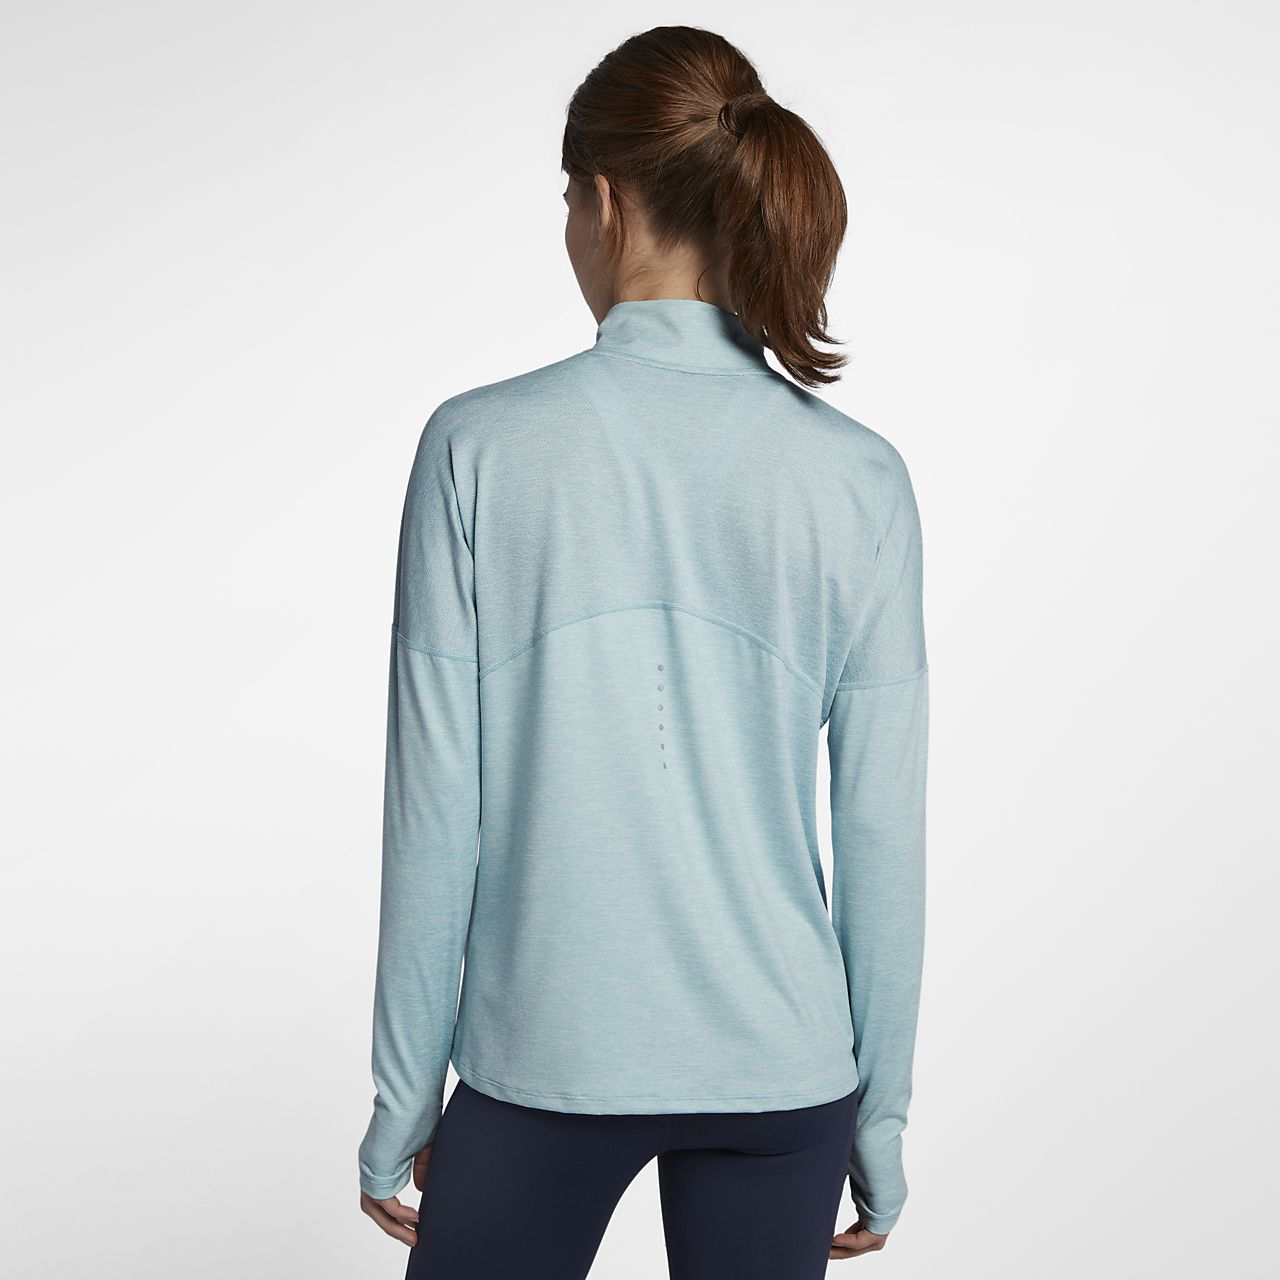 f4d9088b20bc Nike Dri-FIT Element Women s Long-Sleeve Running Half-Zip Top. Nike ...